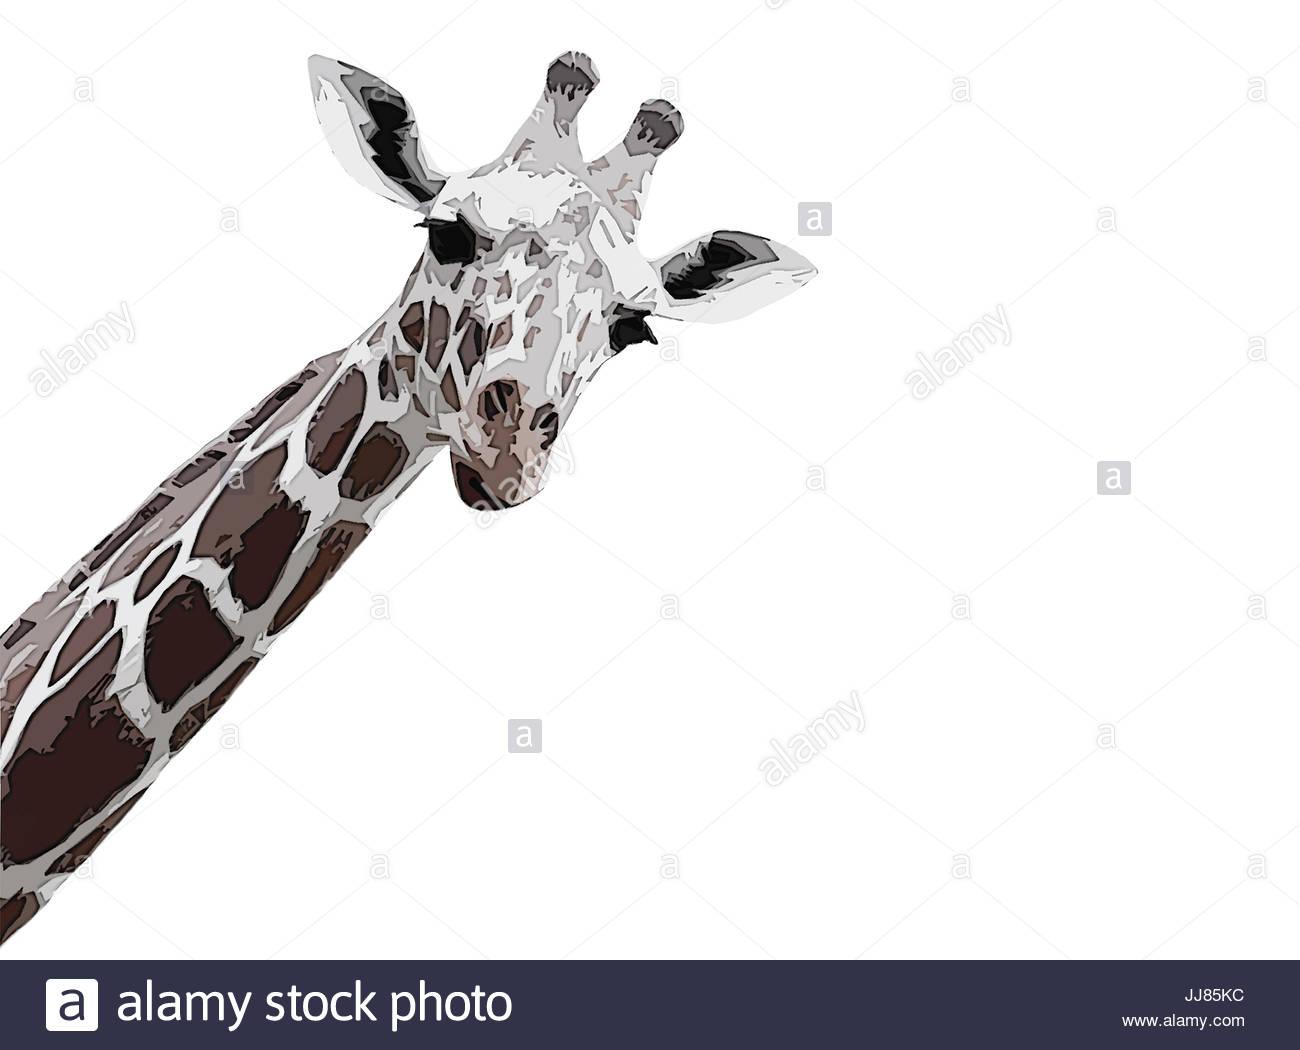 Europa, Deutschland, Hessen, Frankfurt, im Zoo in Frankfurt, neugierig Abstrakte giraffe closeup, Giraffe kunstvoll Stockbild